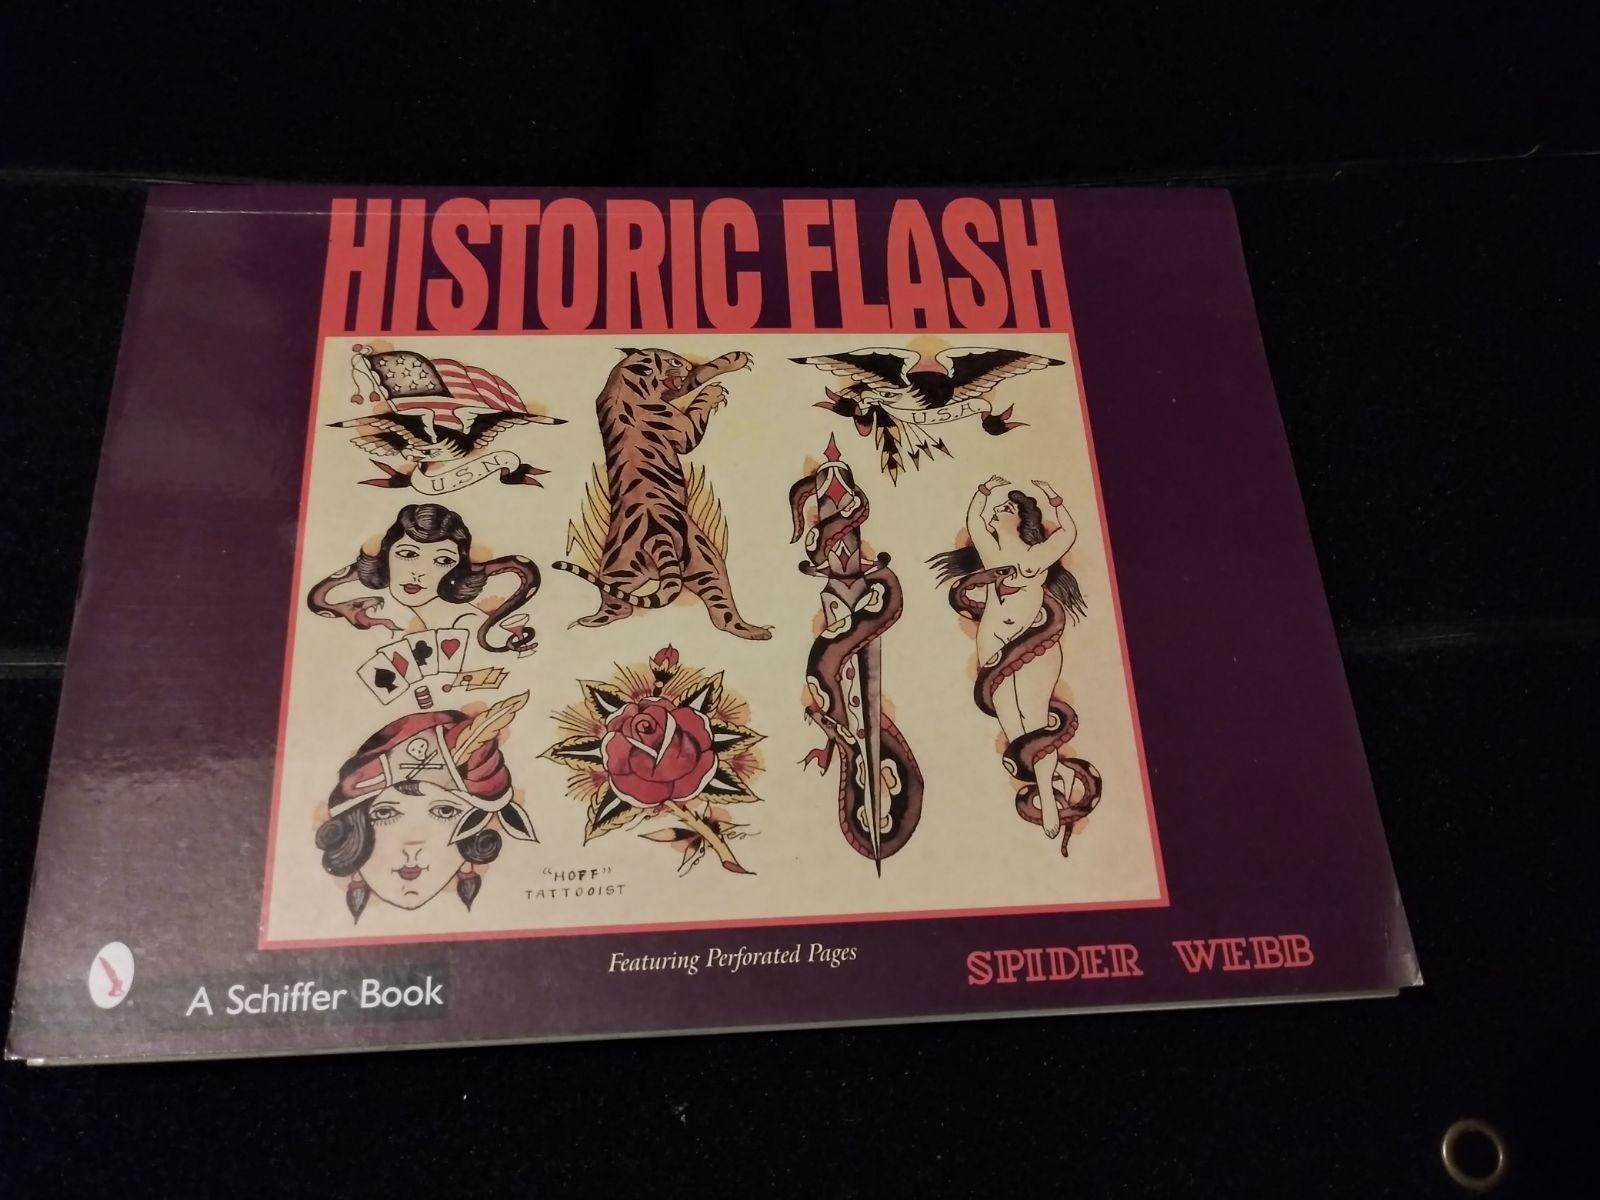 Historic Flash Tattoo Artwork Book